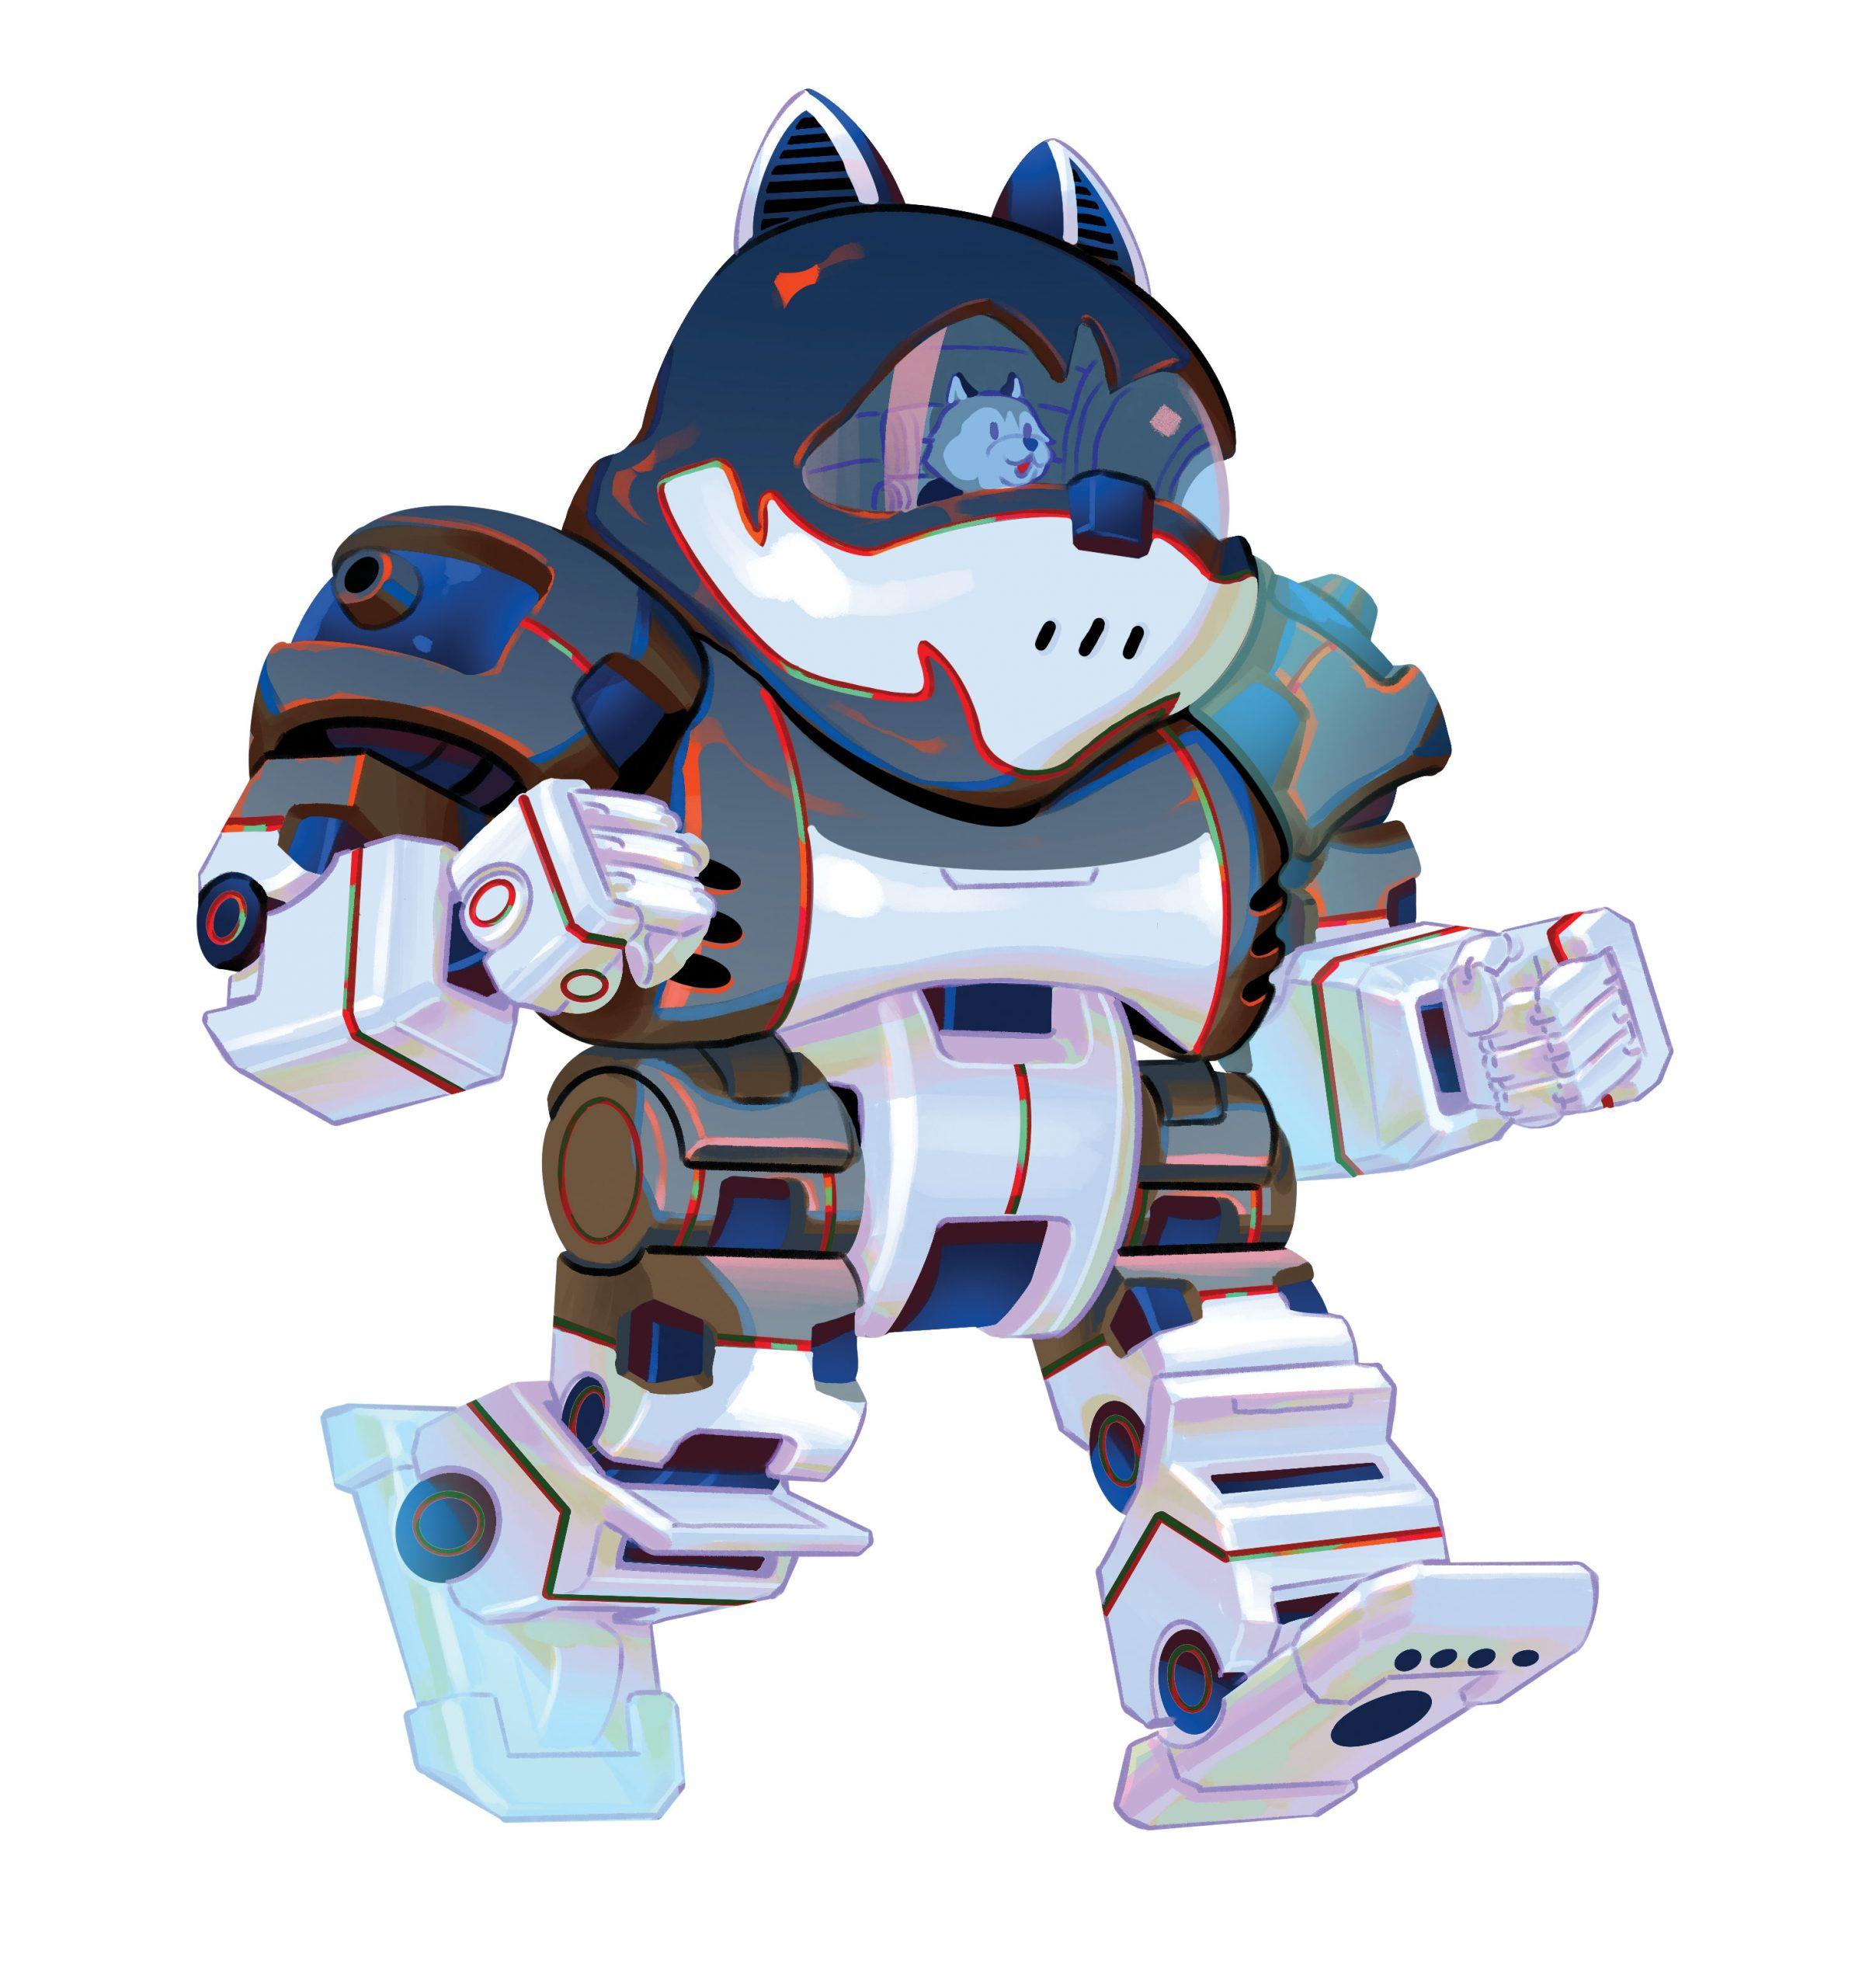 Illustration of a cartoon Jonathon piloting a UConn Husky giant robot